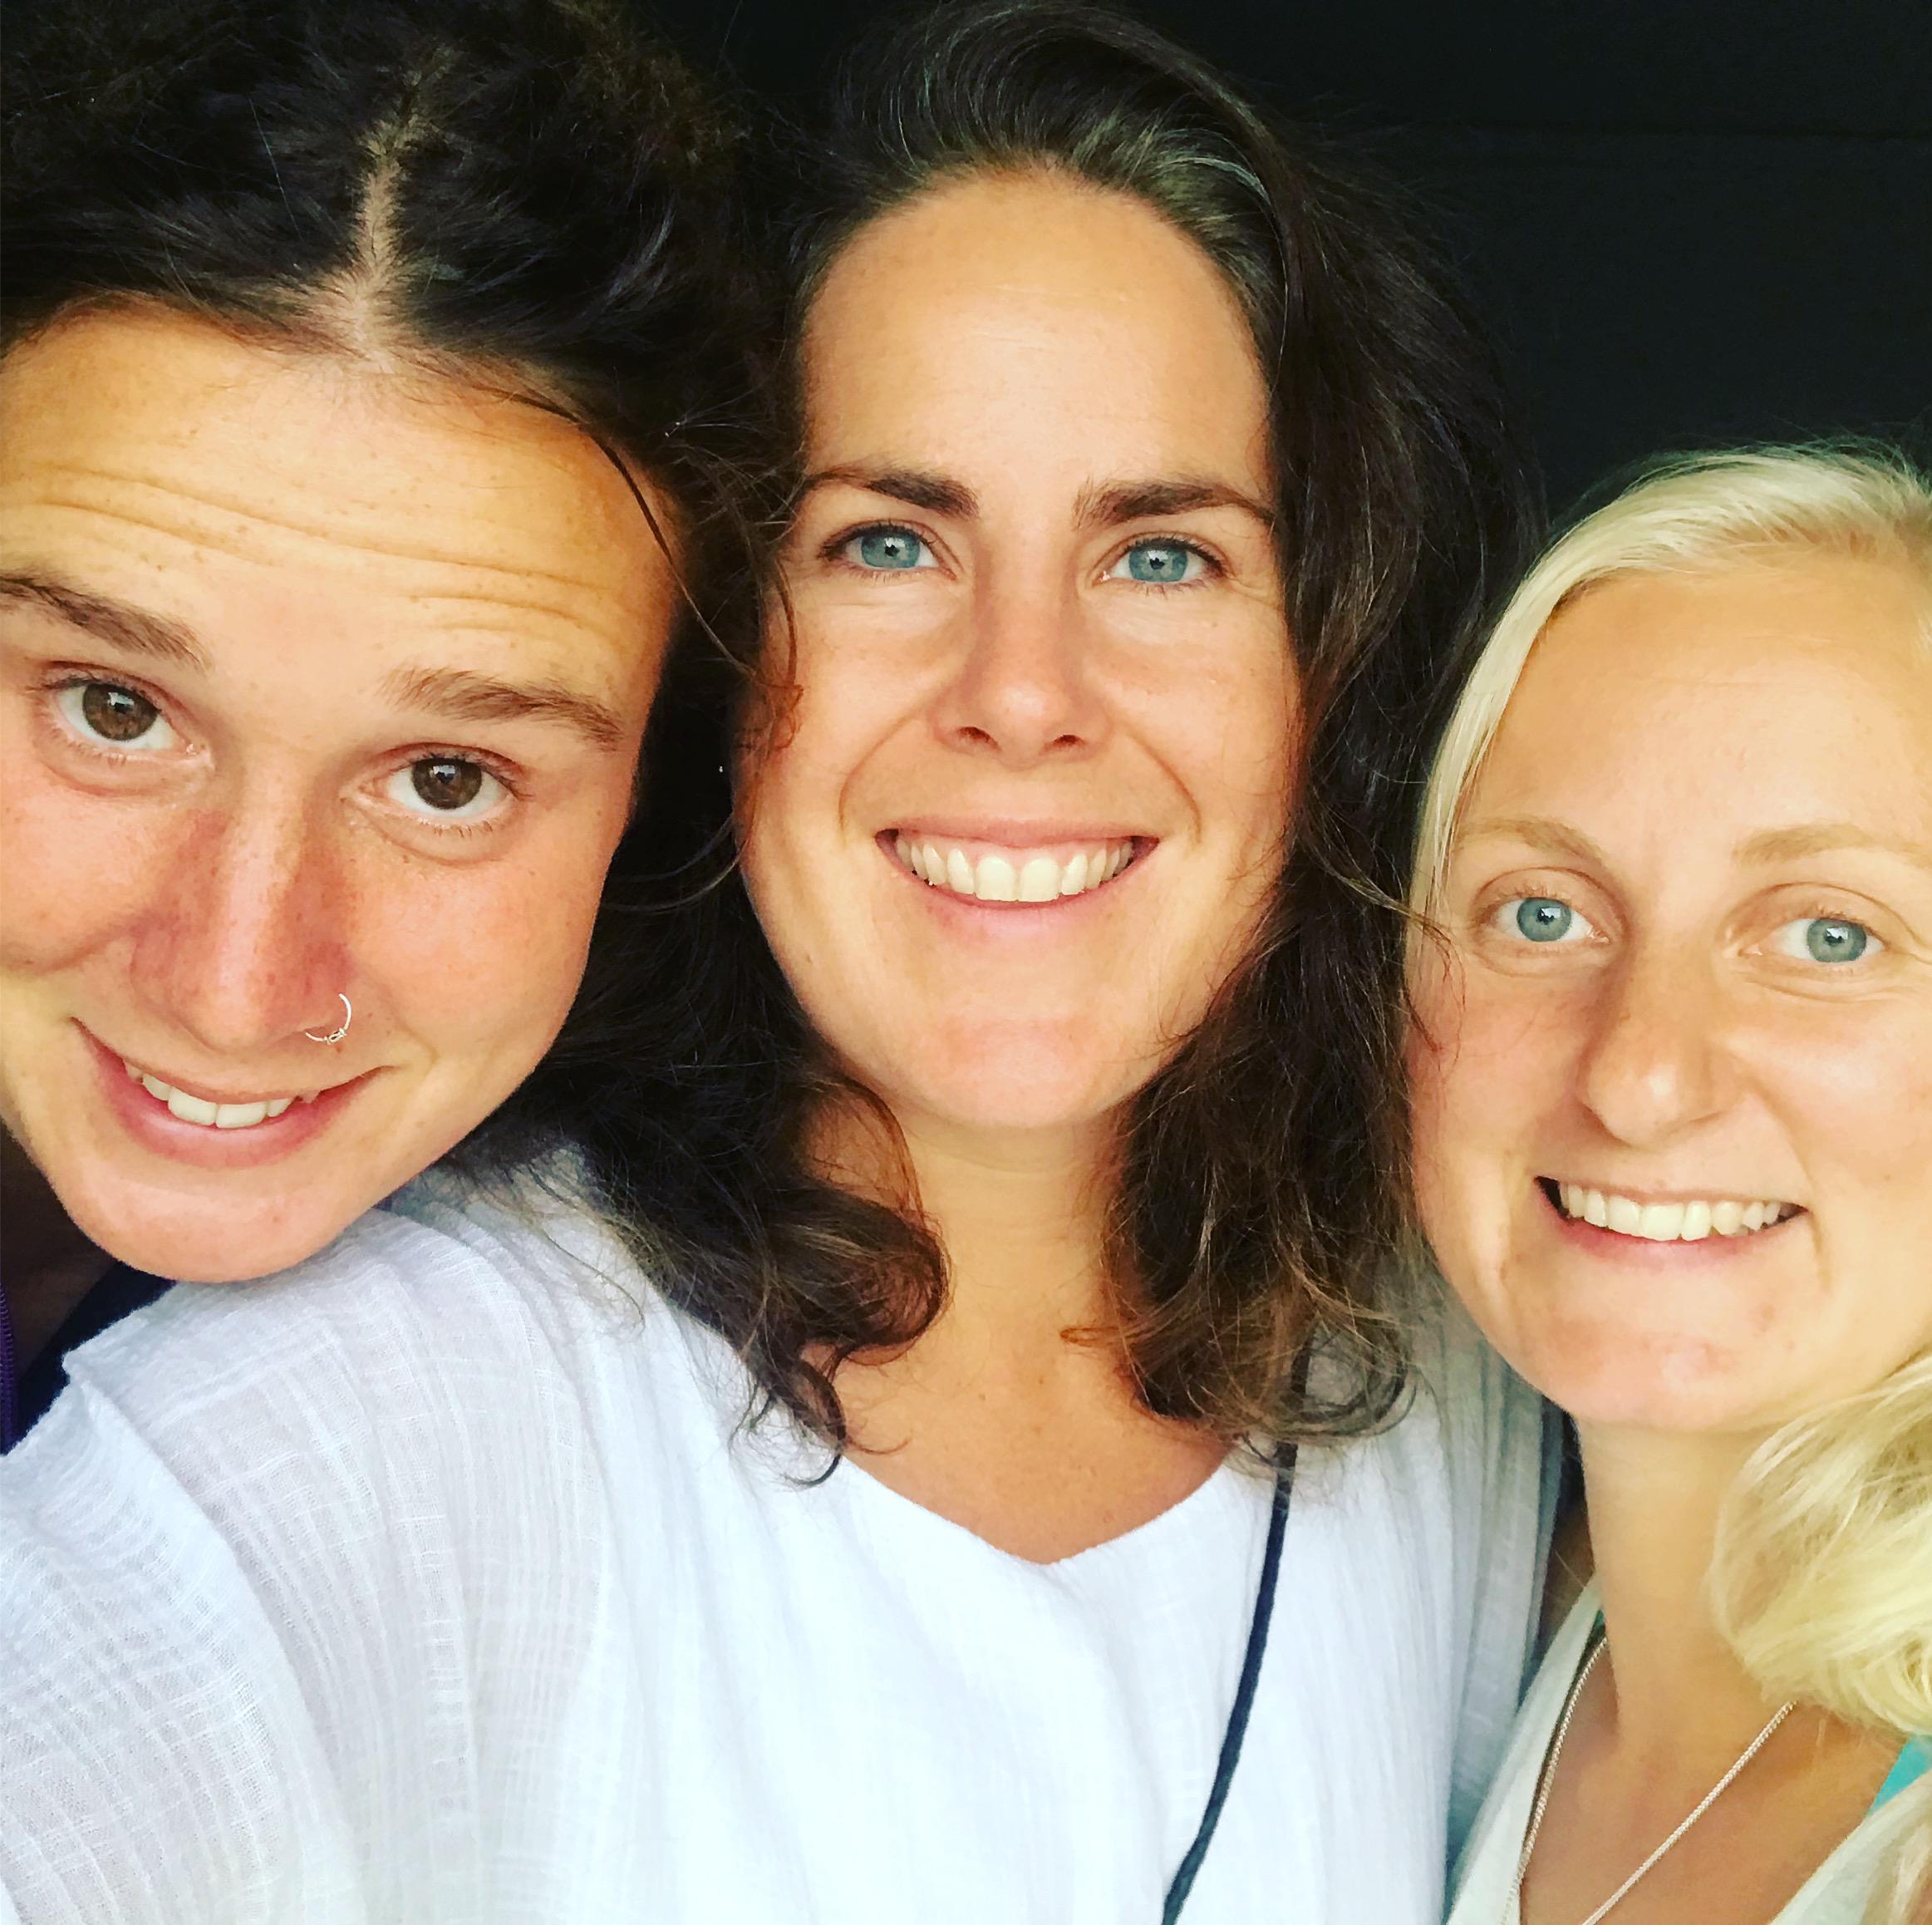 Eleonor Nordwall, Annie Larsson & Anna Blinge <3